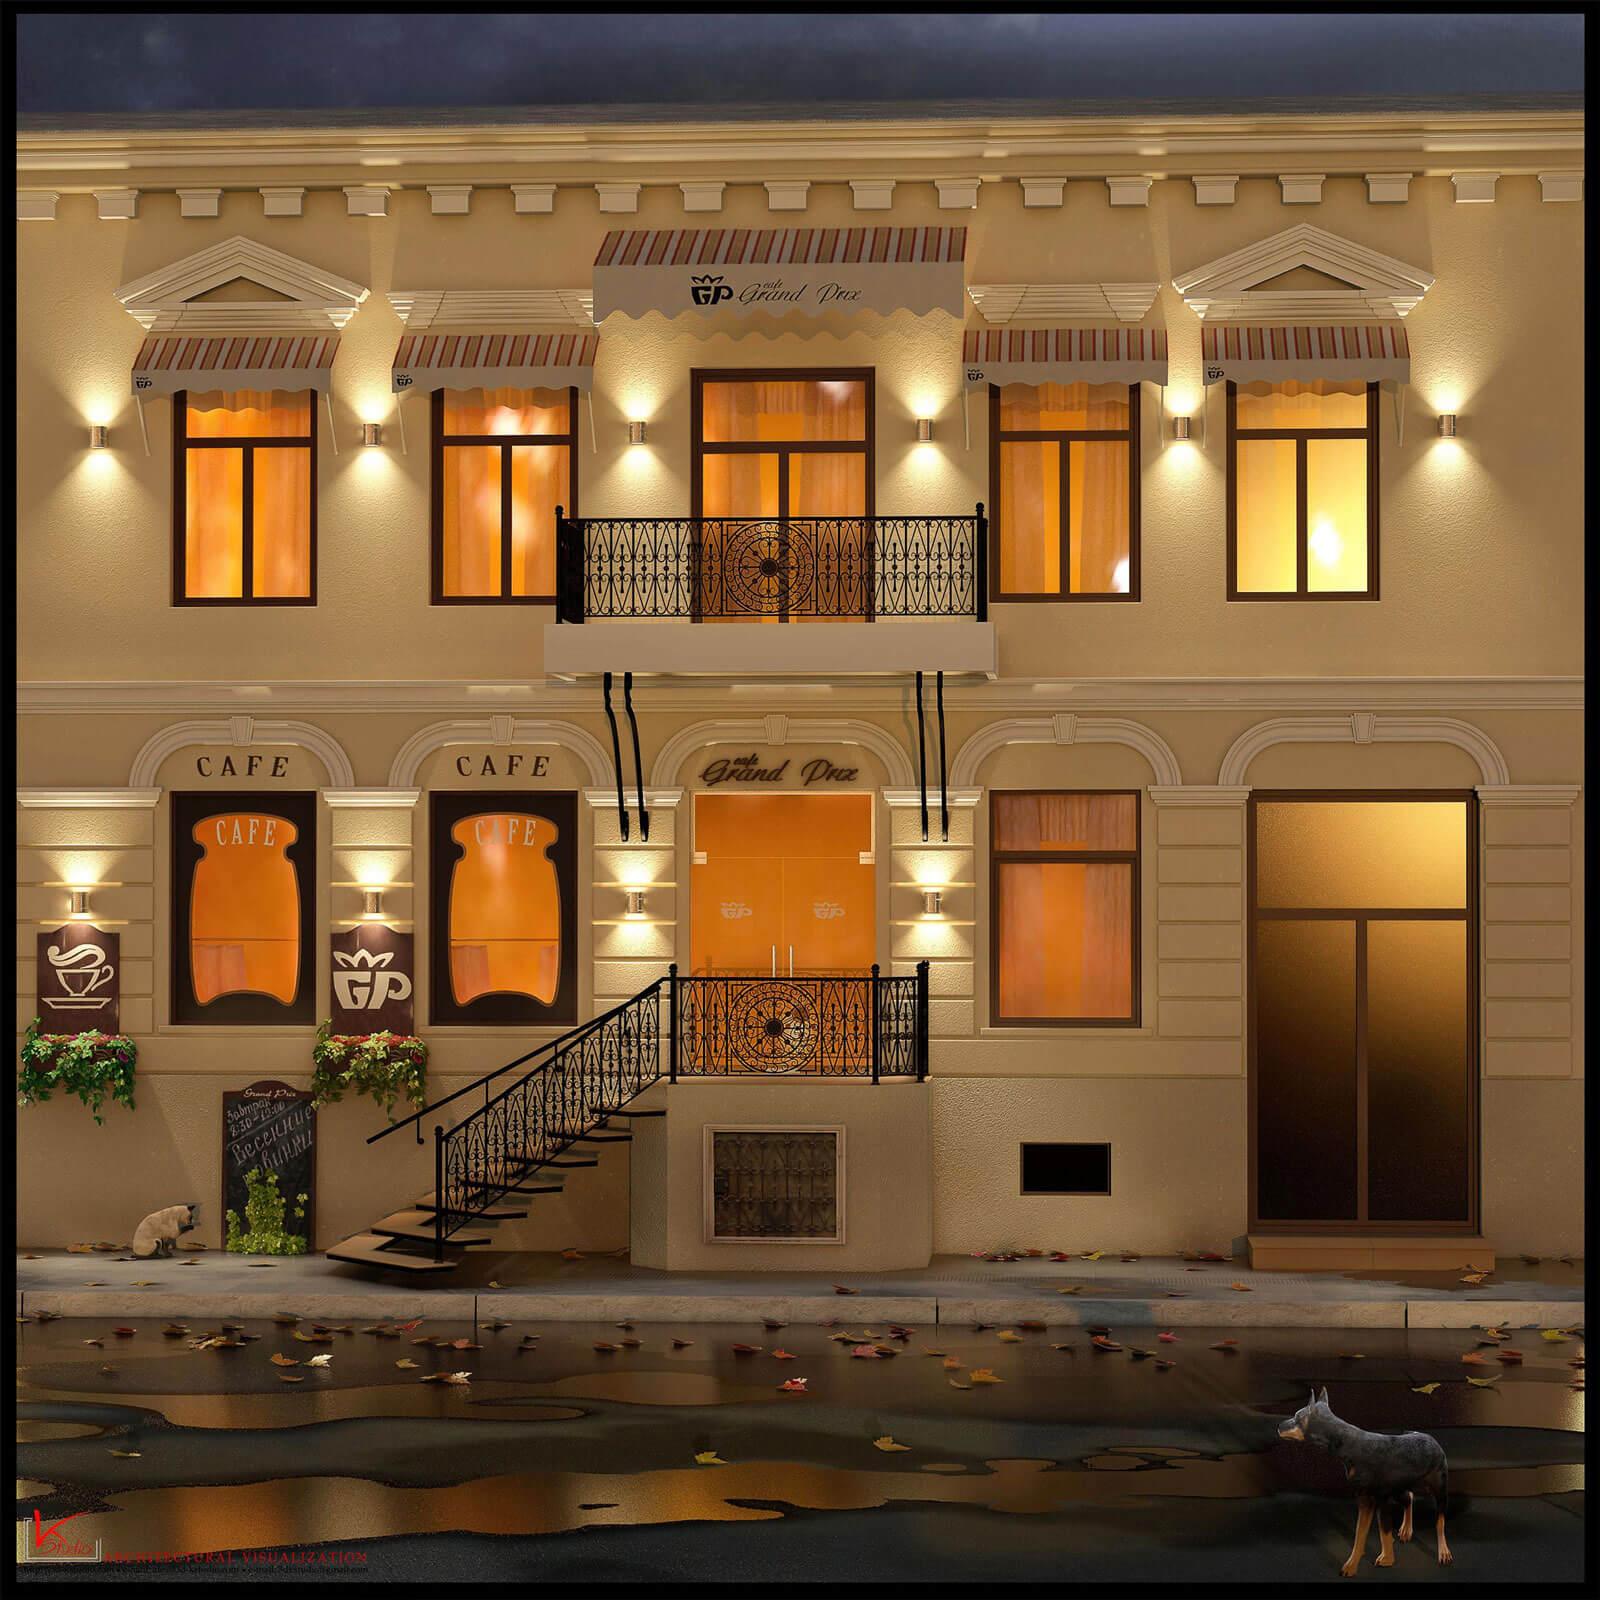 Restaurant 'Grand Prix' in Odessa